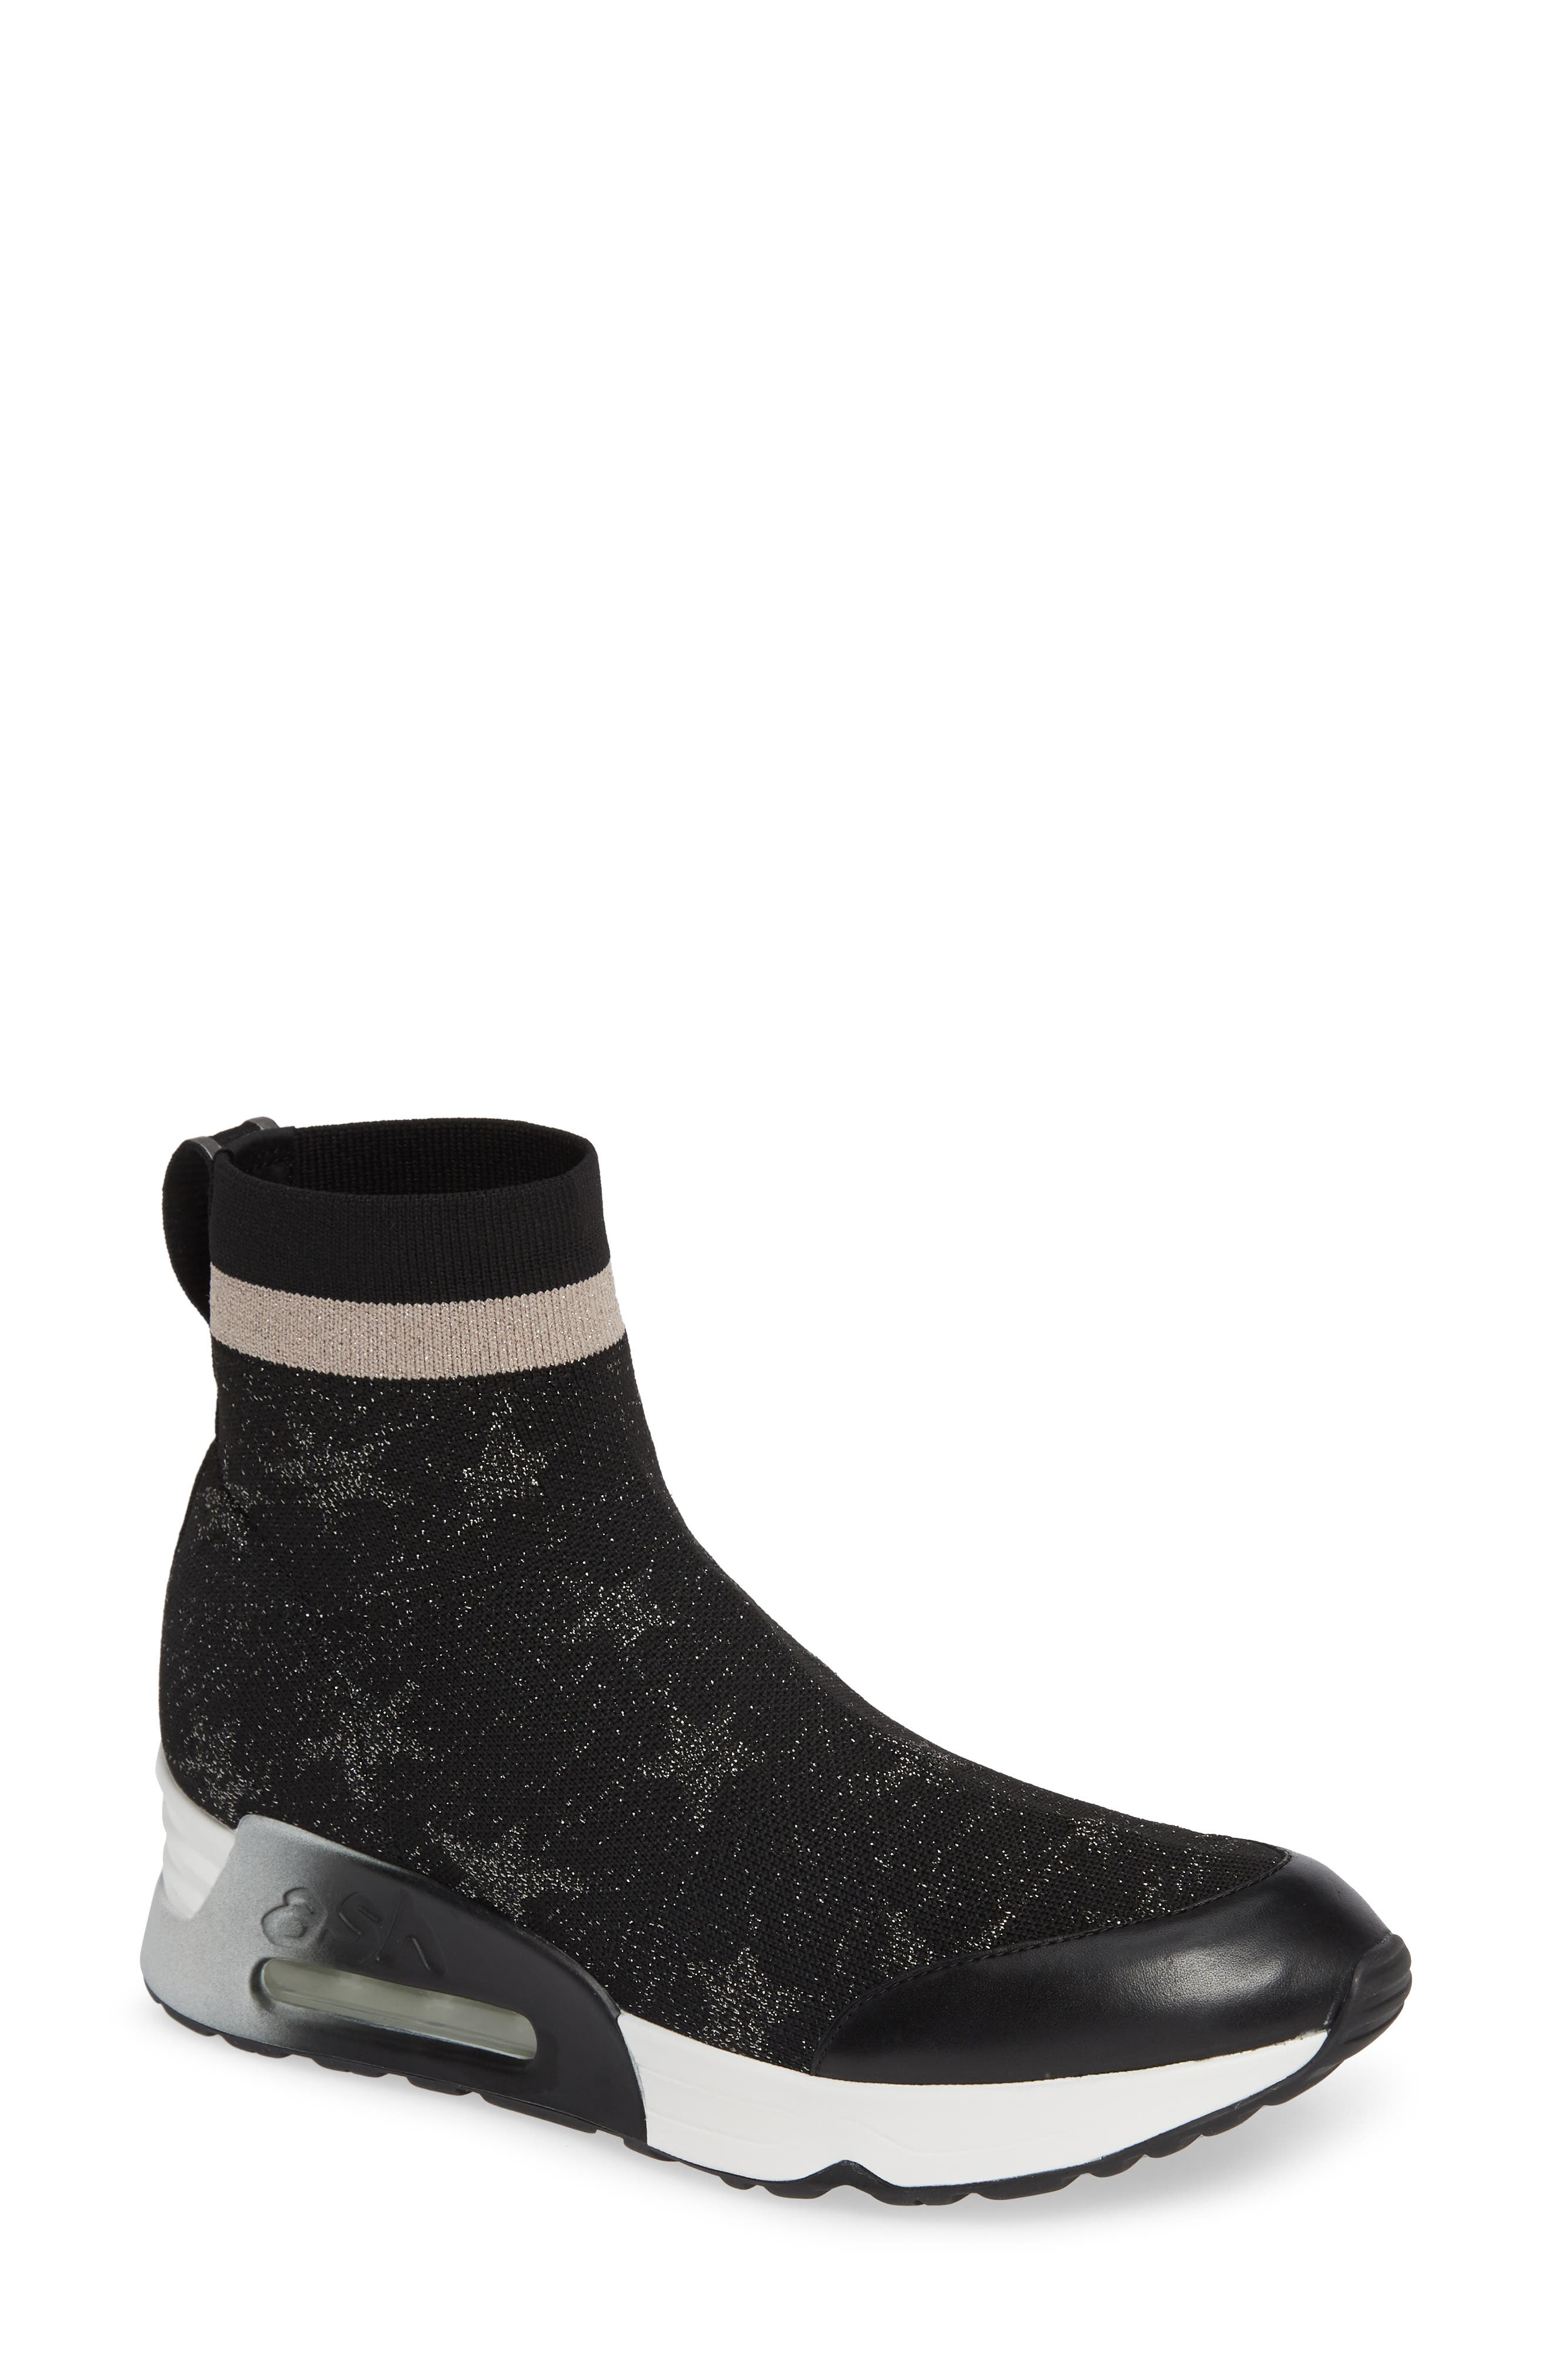 Women'S Lulla Star Print Knit Platform Sneakers in Black/ Old Silver/ Black